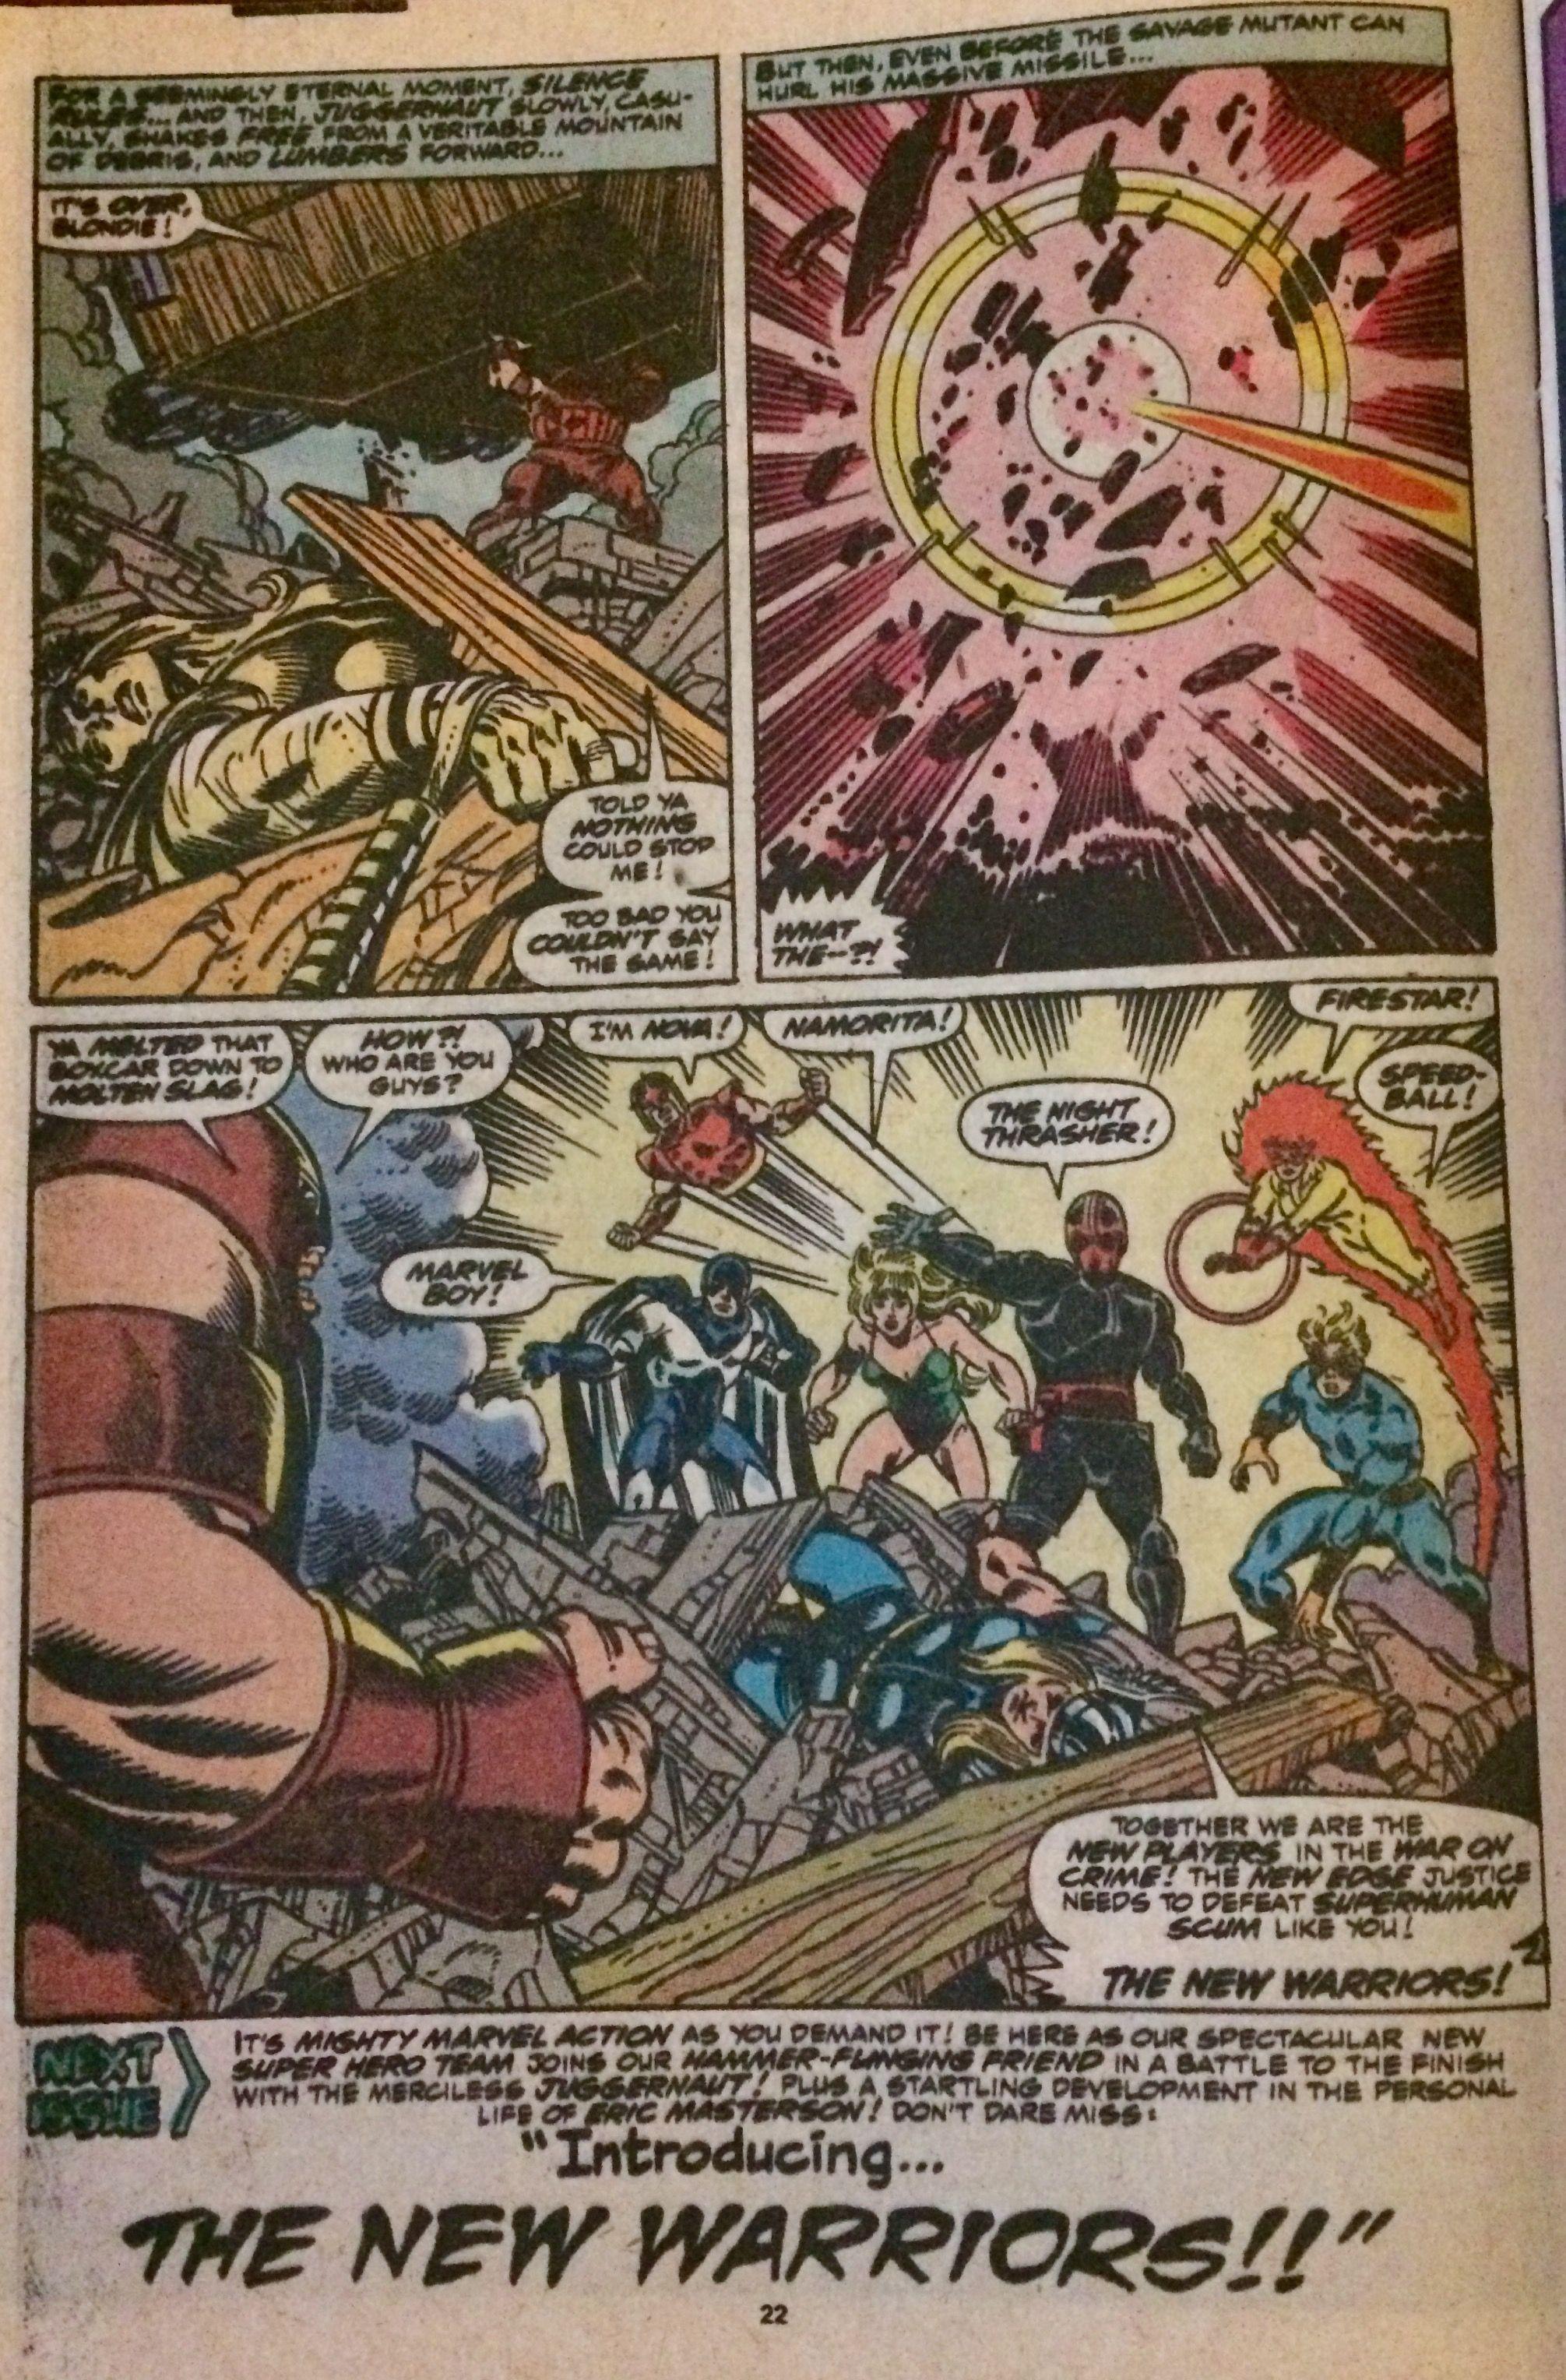 Juggernaut vs The New Warriors-1989